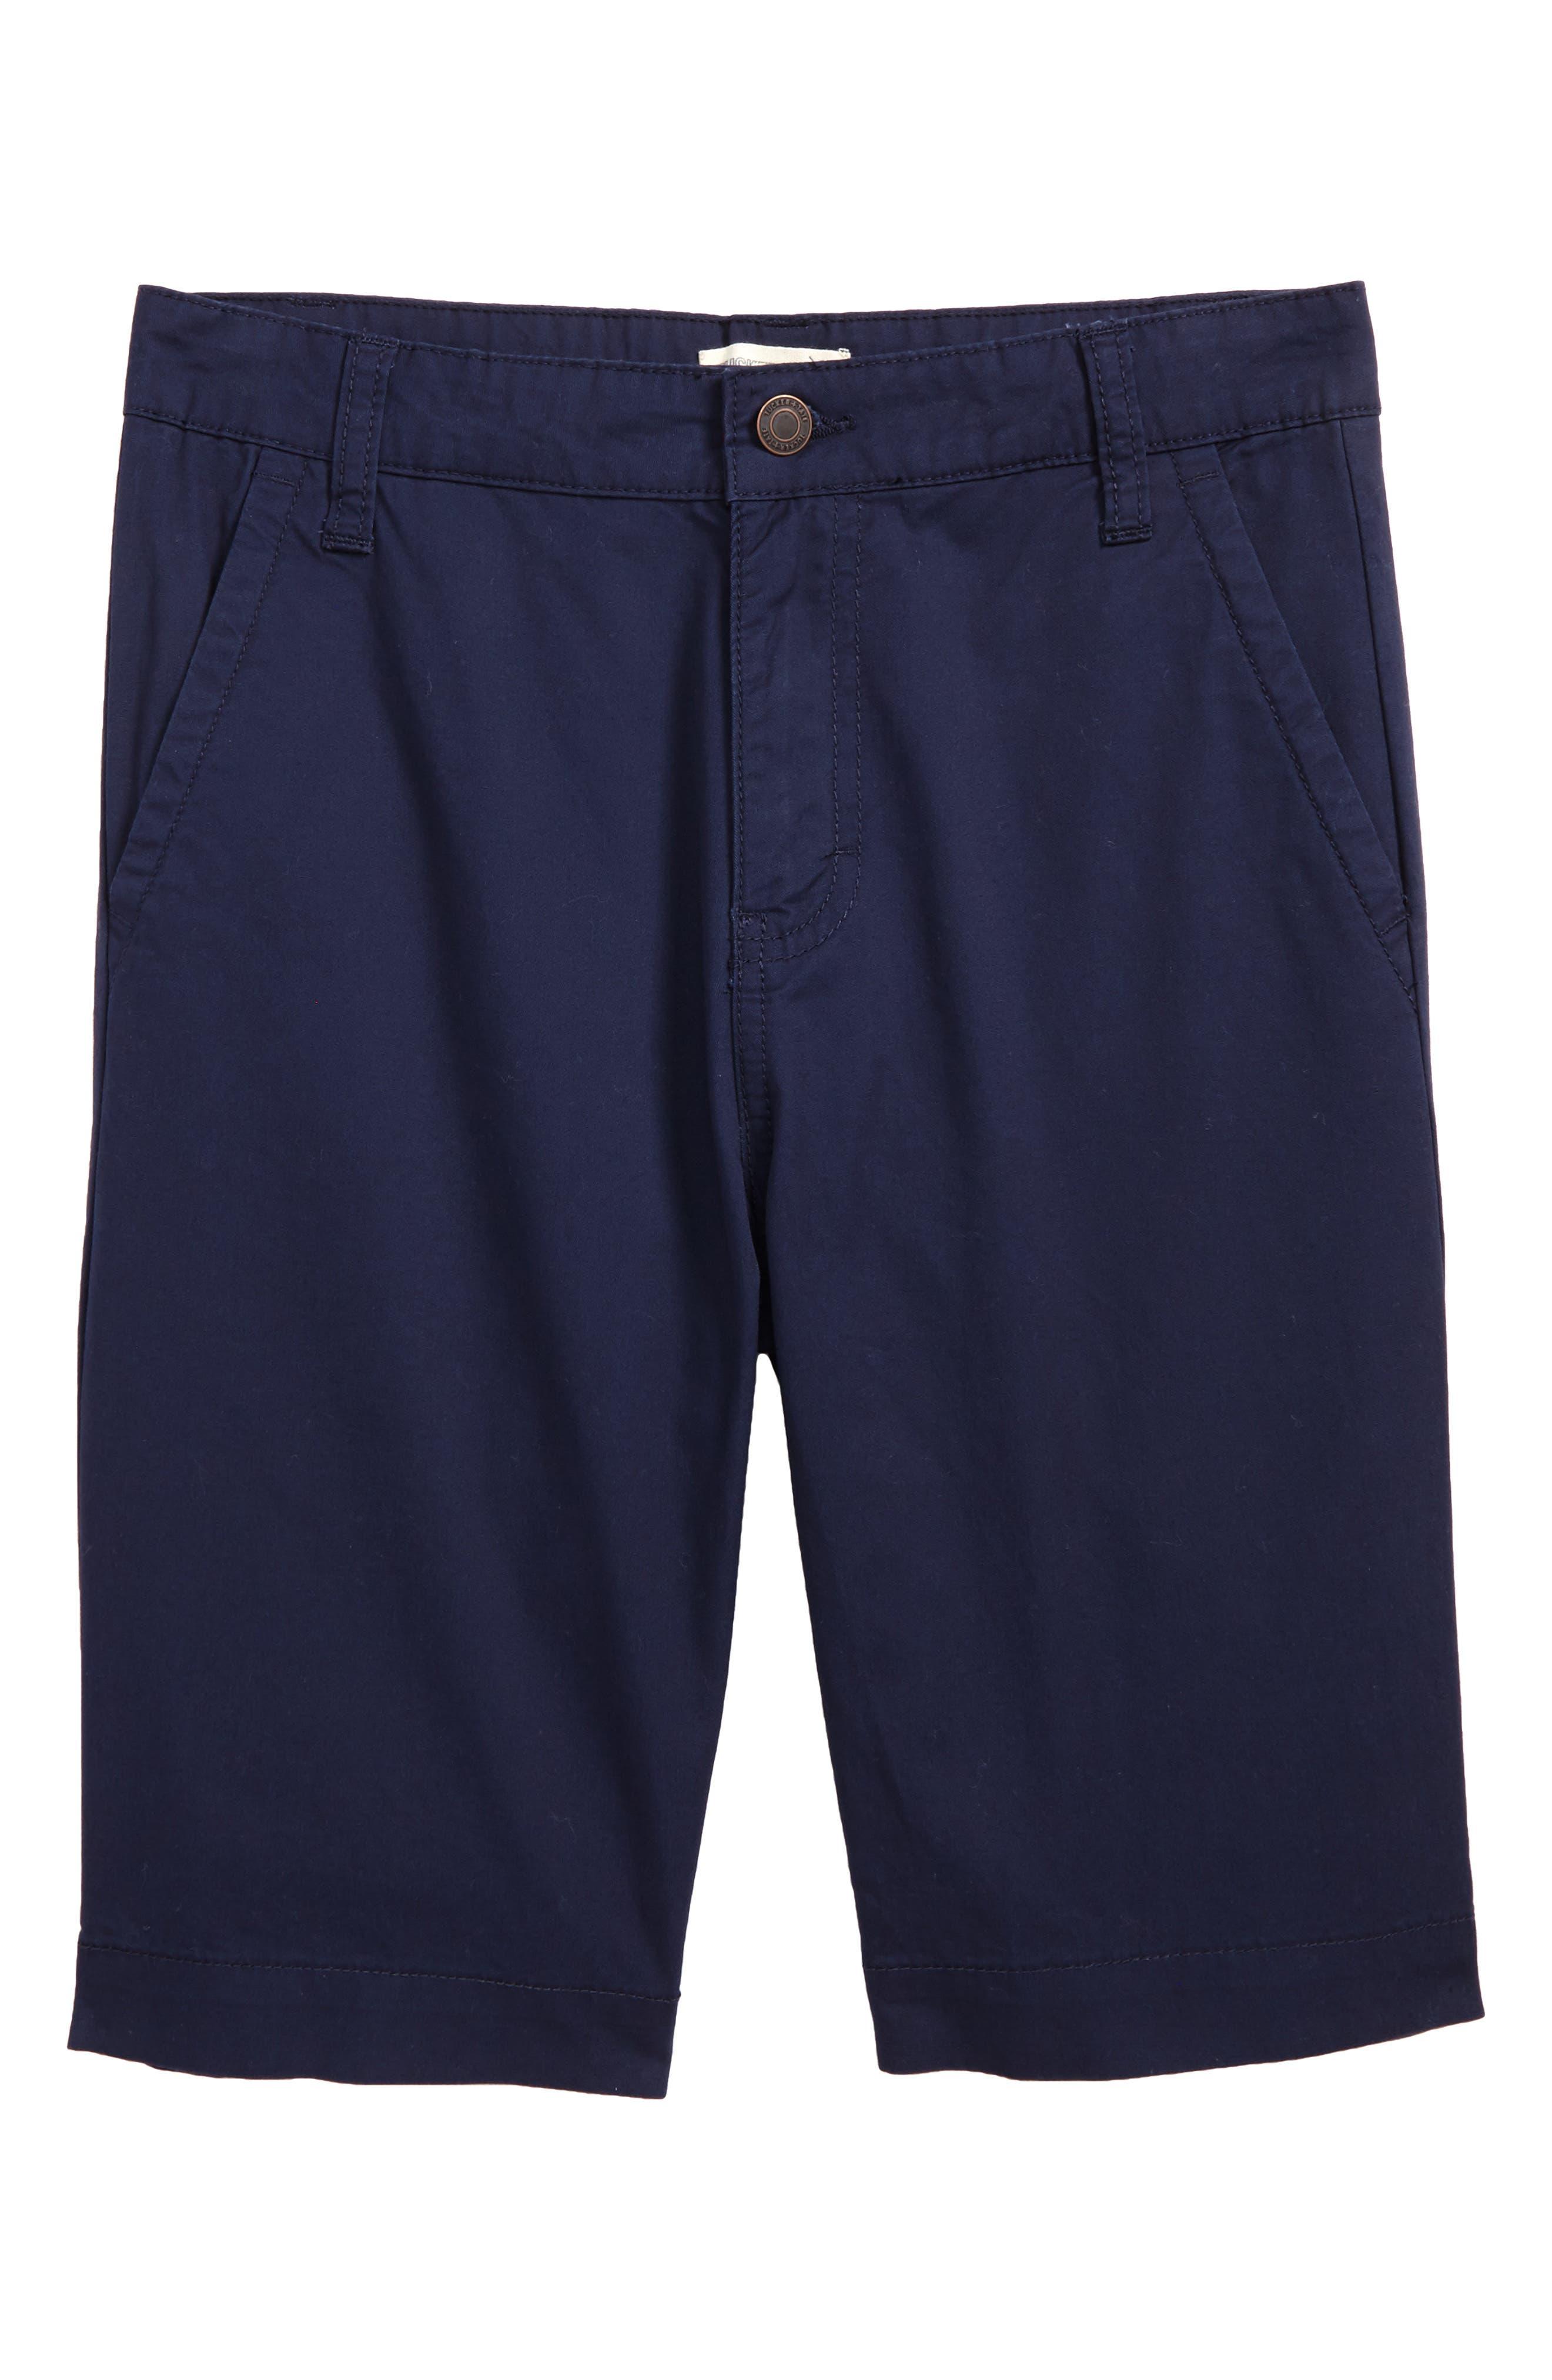 Main Image - Tucker + Tate Chino Shorts (Big Boys)